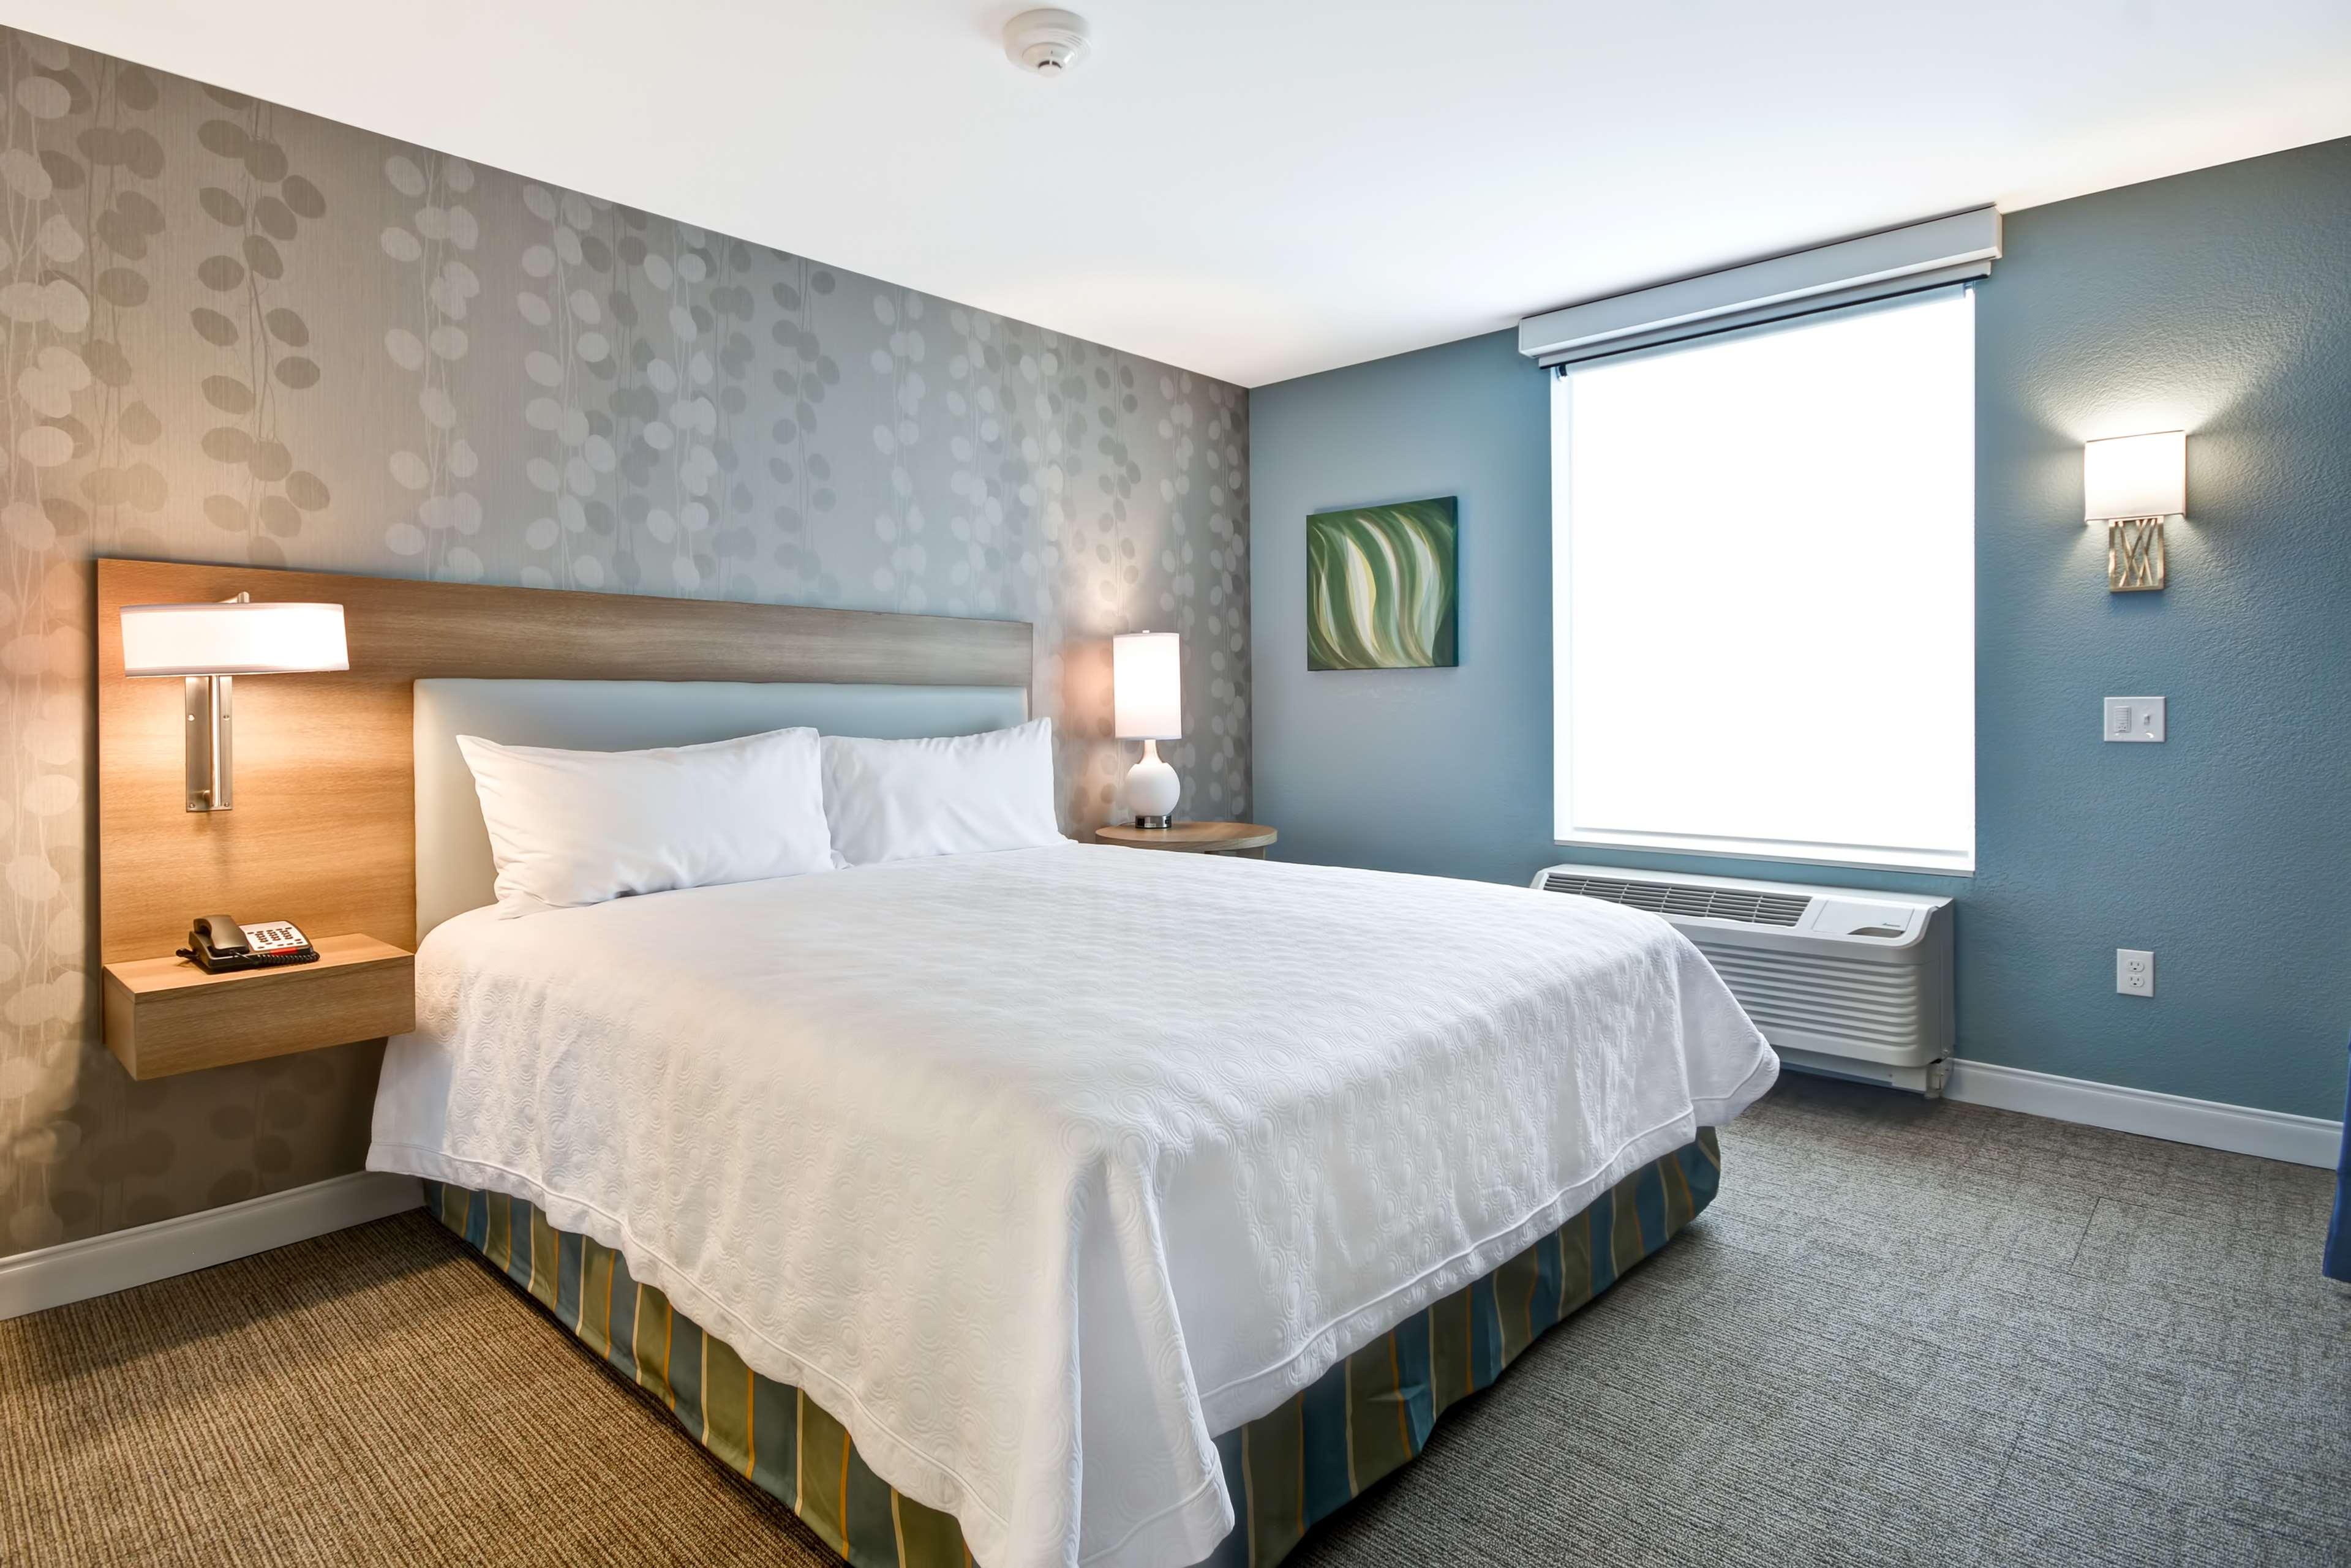 Home2 Suites by Hilton Jackson image 14